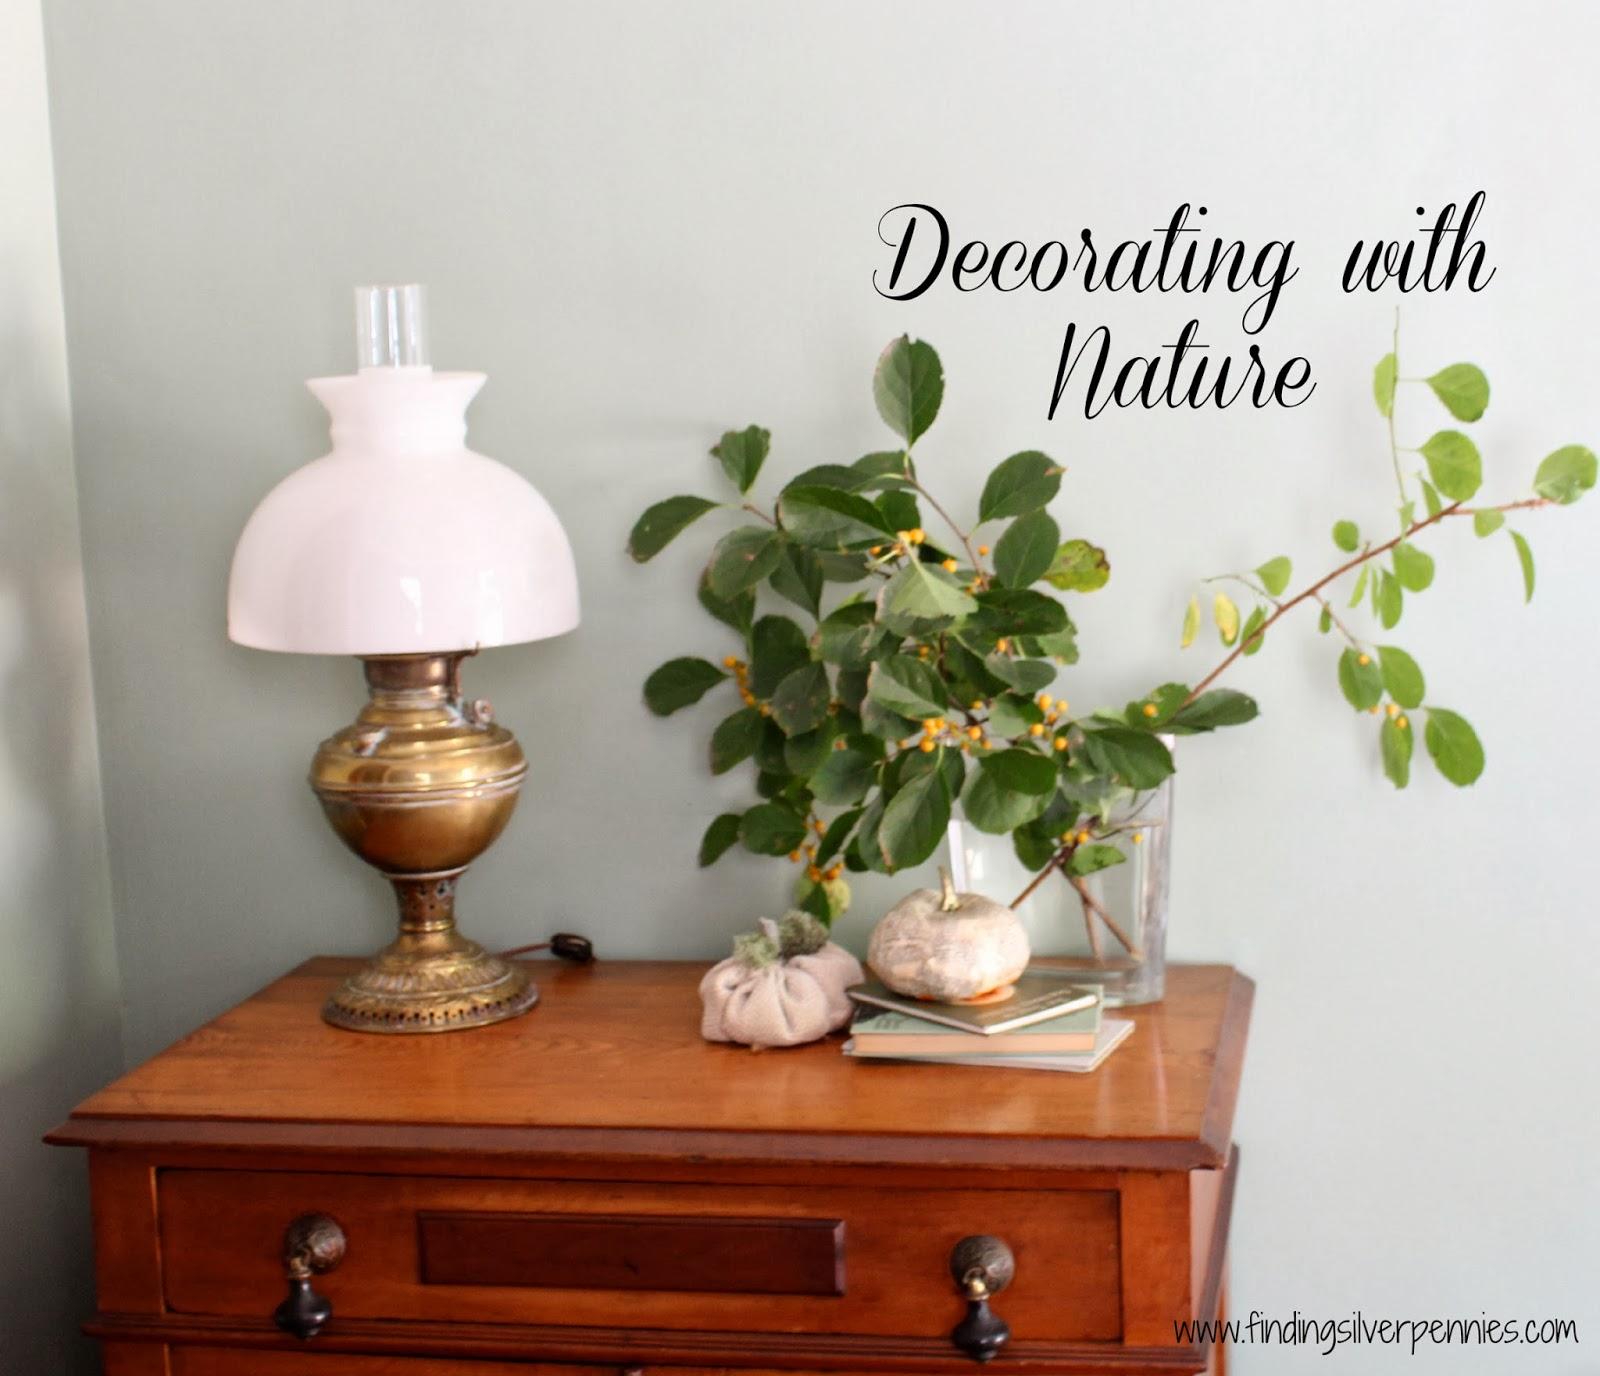 http://1.bp.blogspot.com/-6oYCgkfqqAM/Uk32mkIOrdI/AAAAAAAAoMA/IDMlKjZ8uMc/s1600/decorating_with_nature.jpg